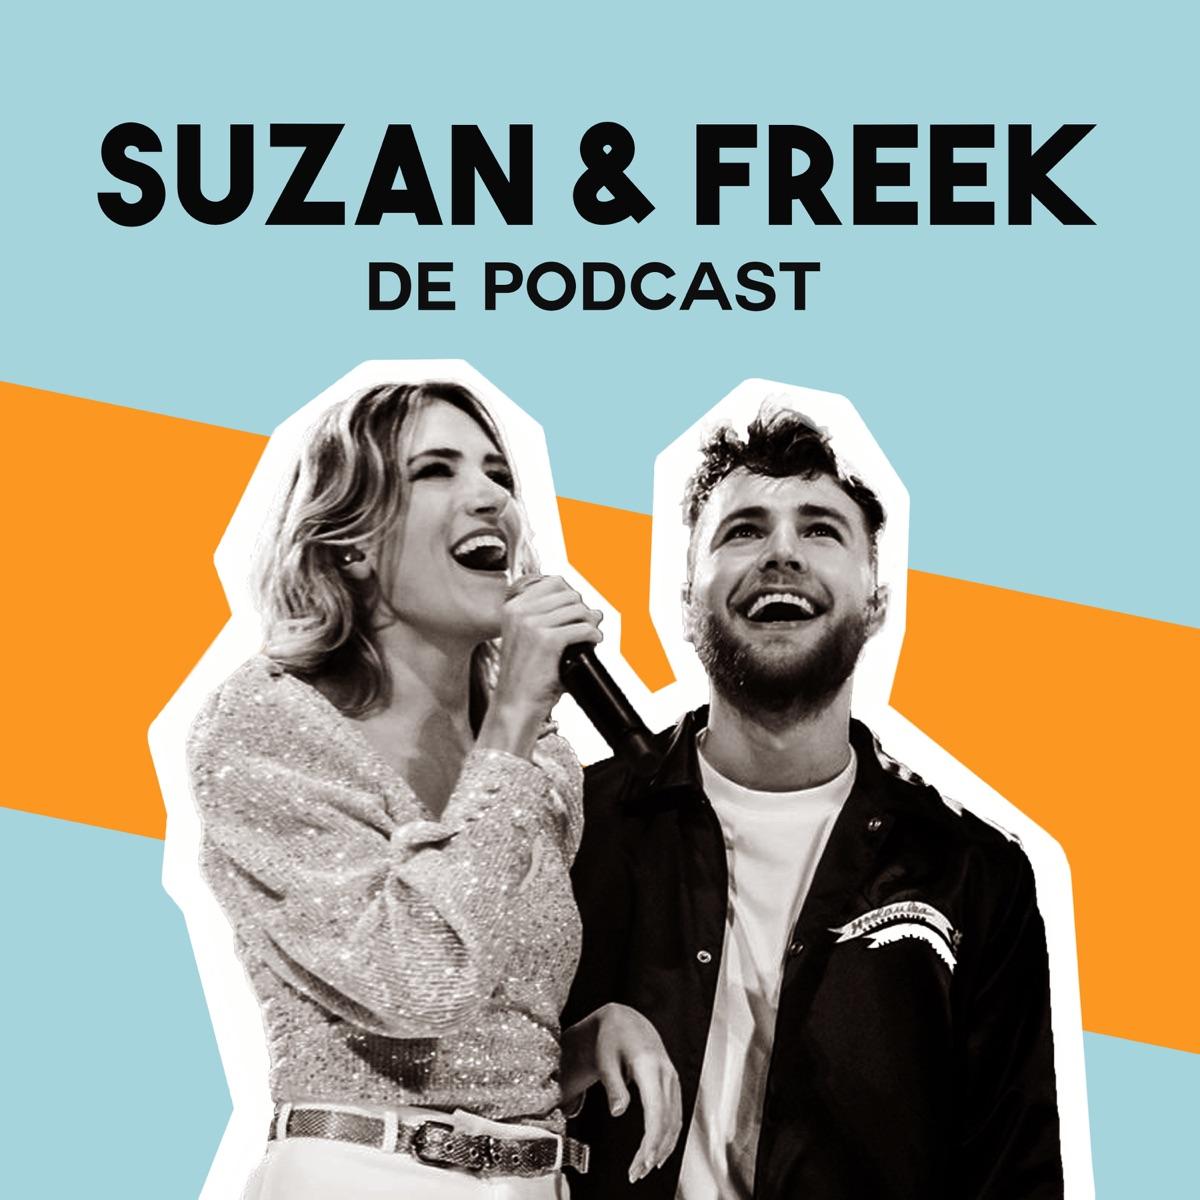 Suzan & Freek, de podcast